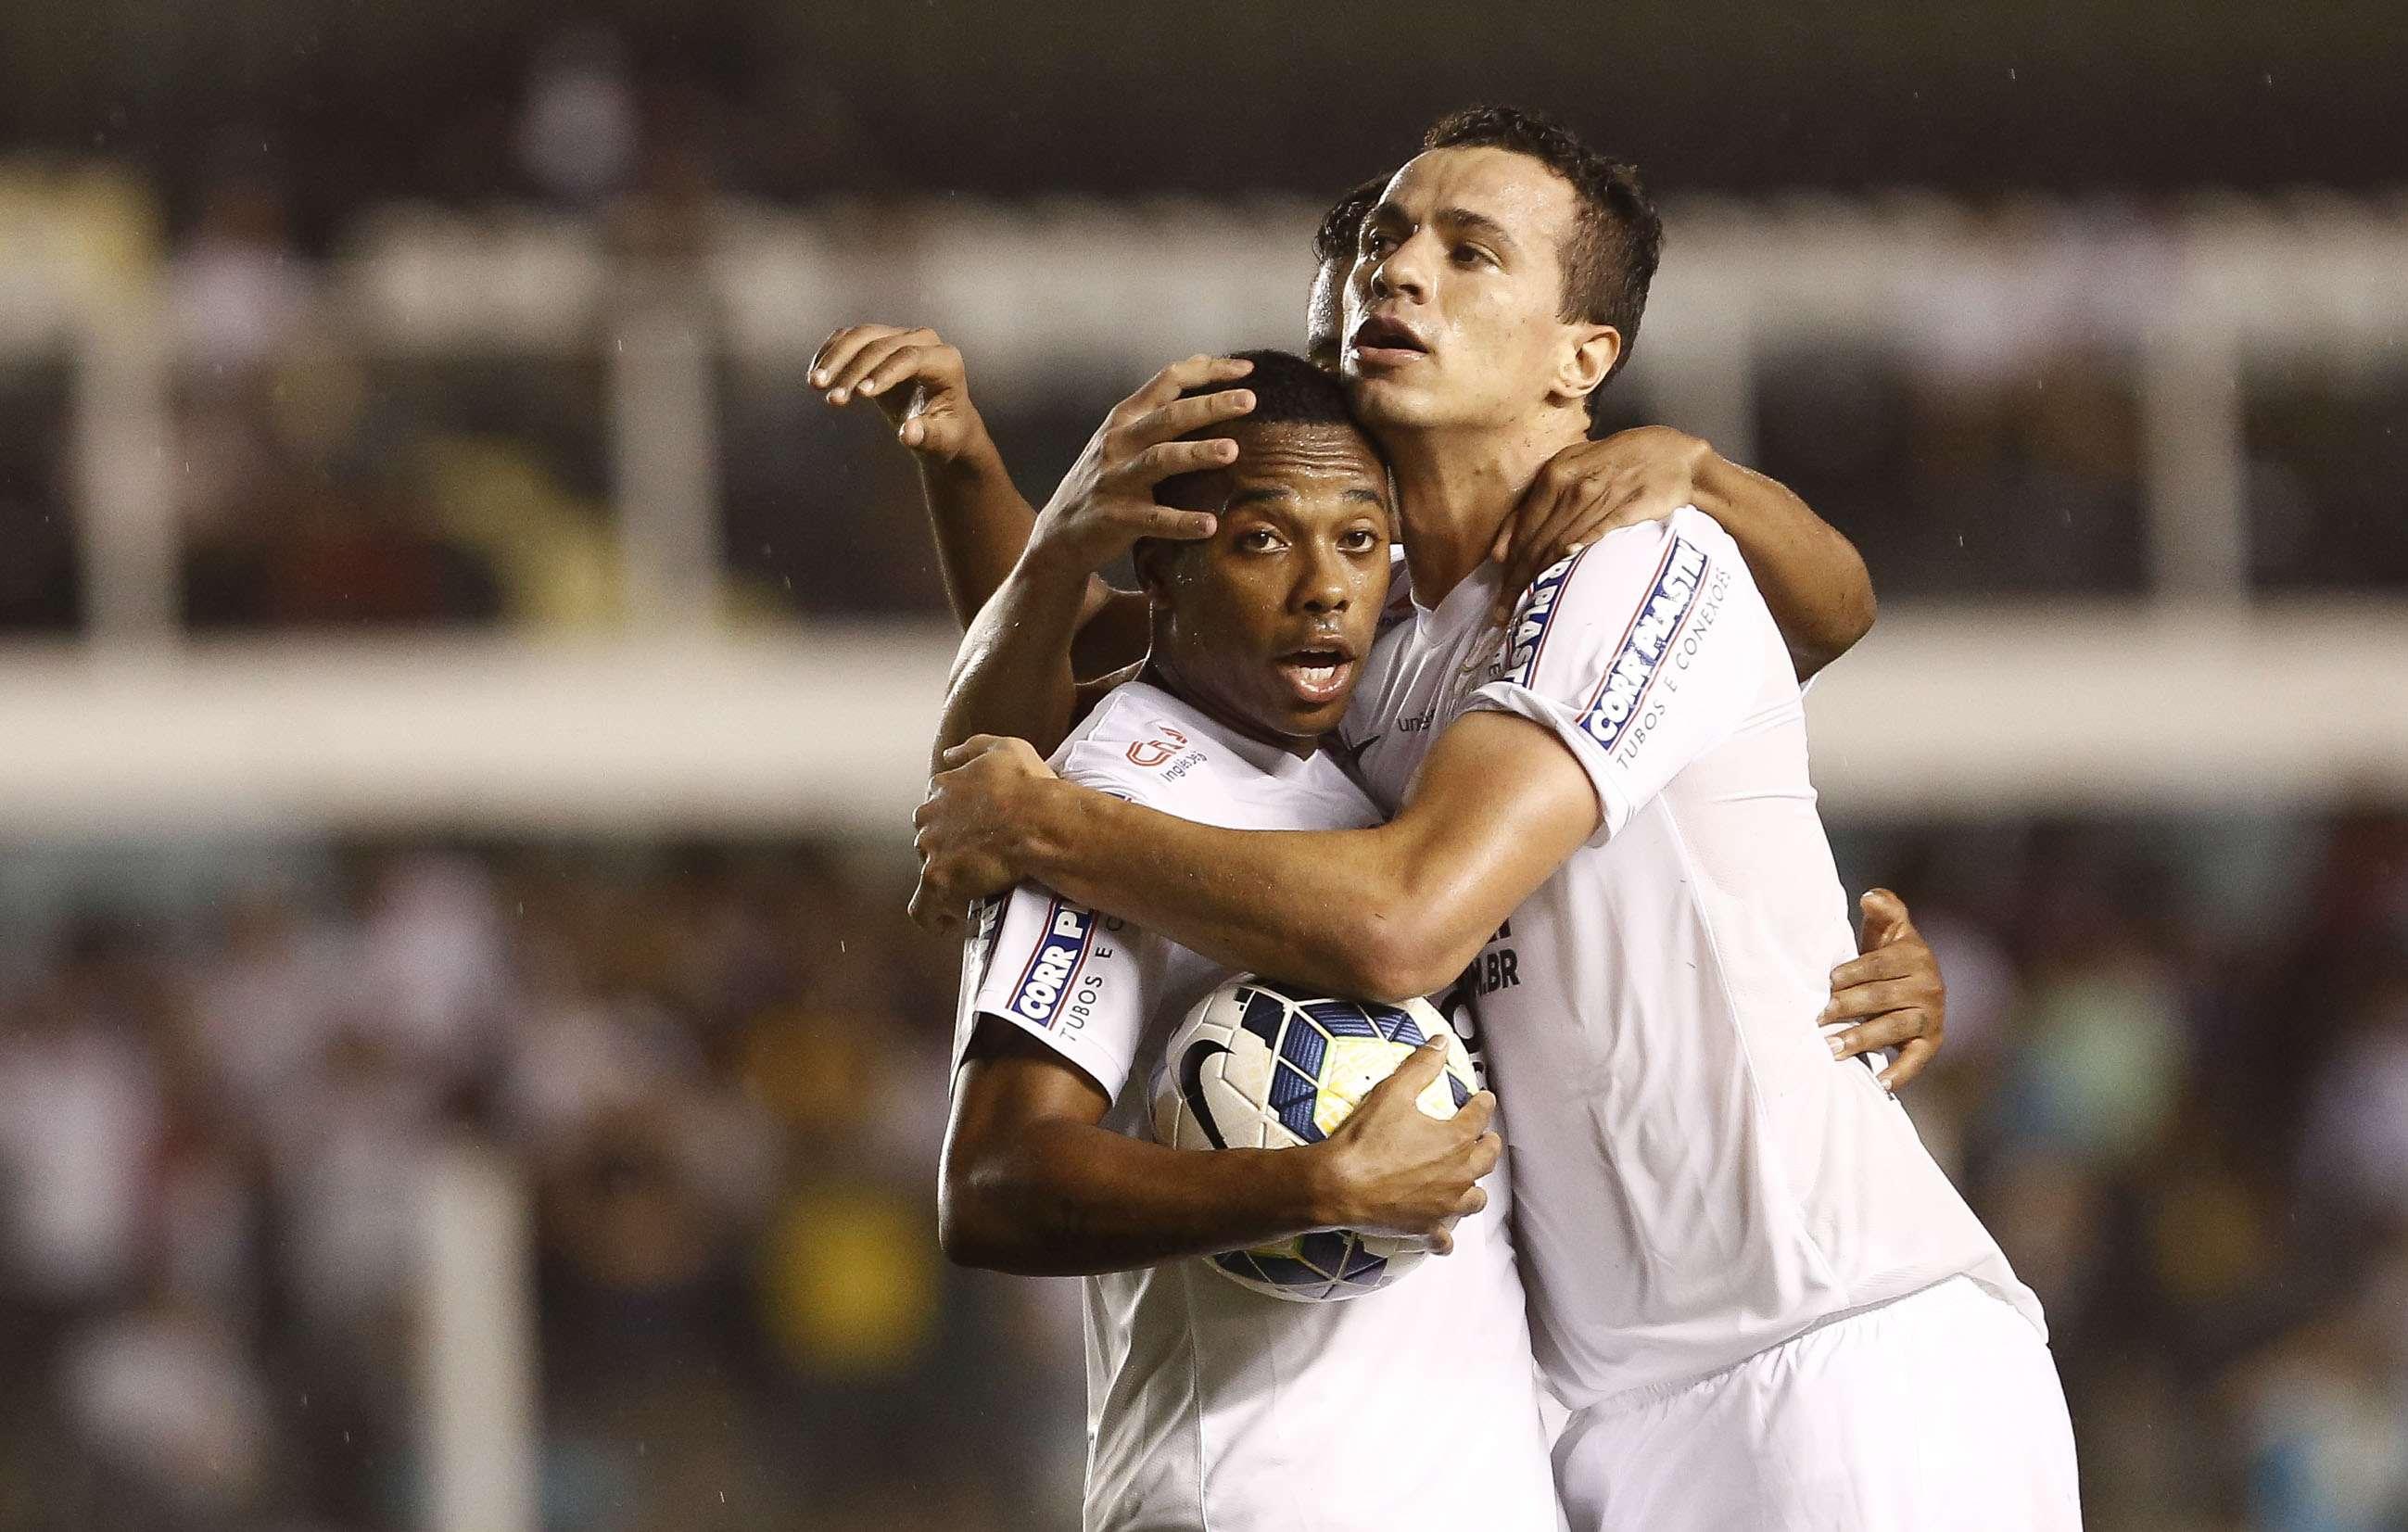 Robinho comemora gol marcado na Vila Belmiro Foto: Miguel Schincariol/Getty Images